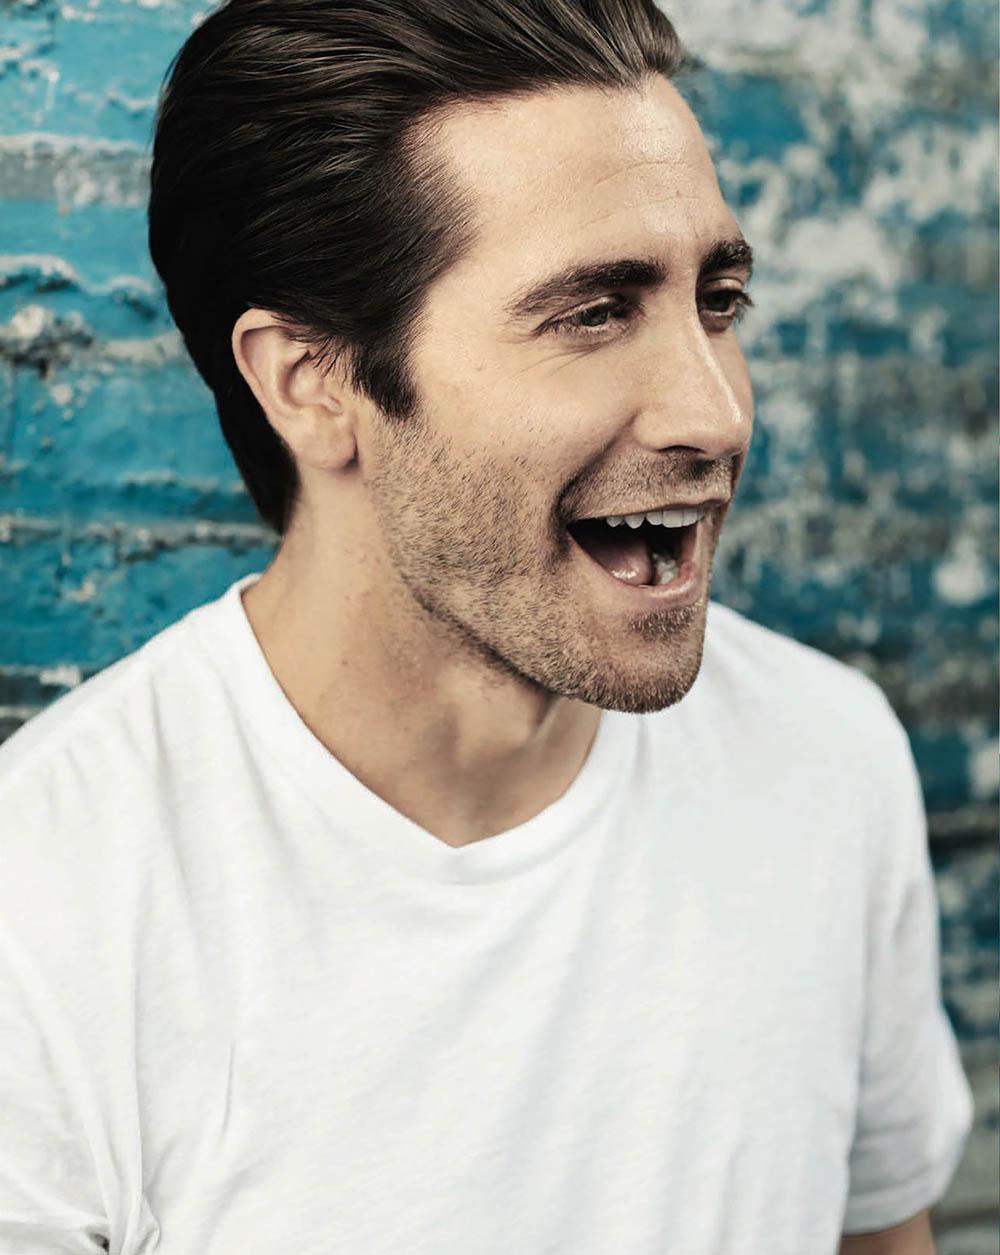 Jake Gyllenhaal covers GQ Australia February 2018 by Doug Inglish